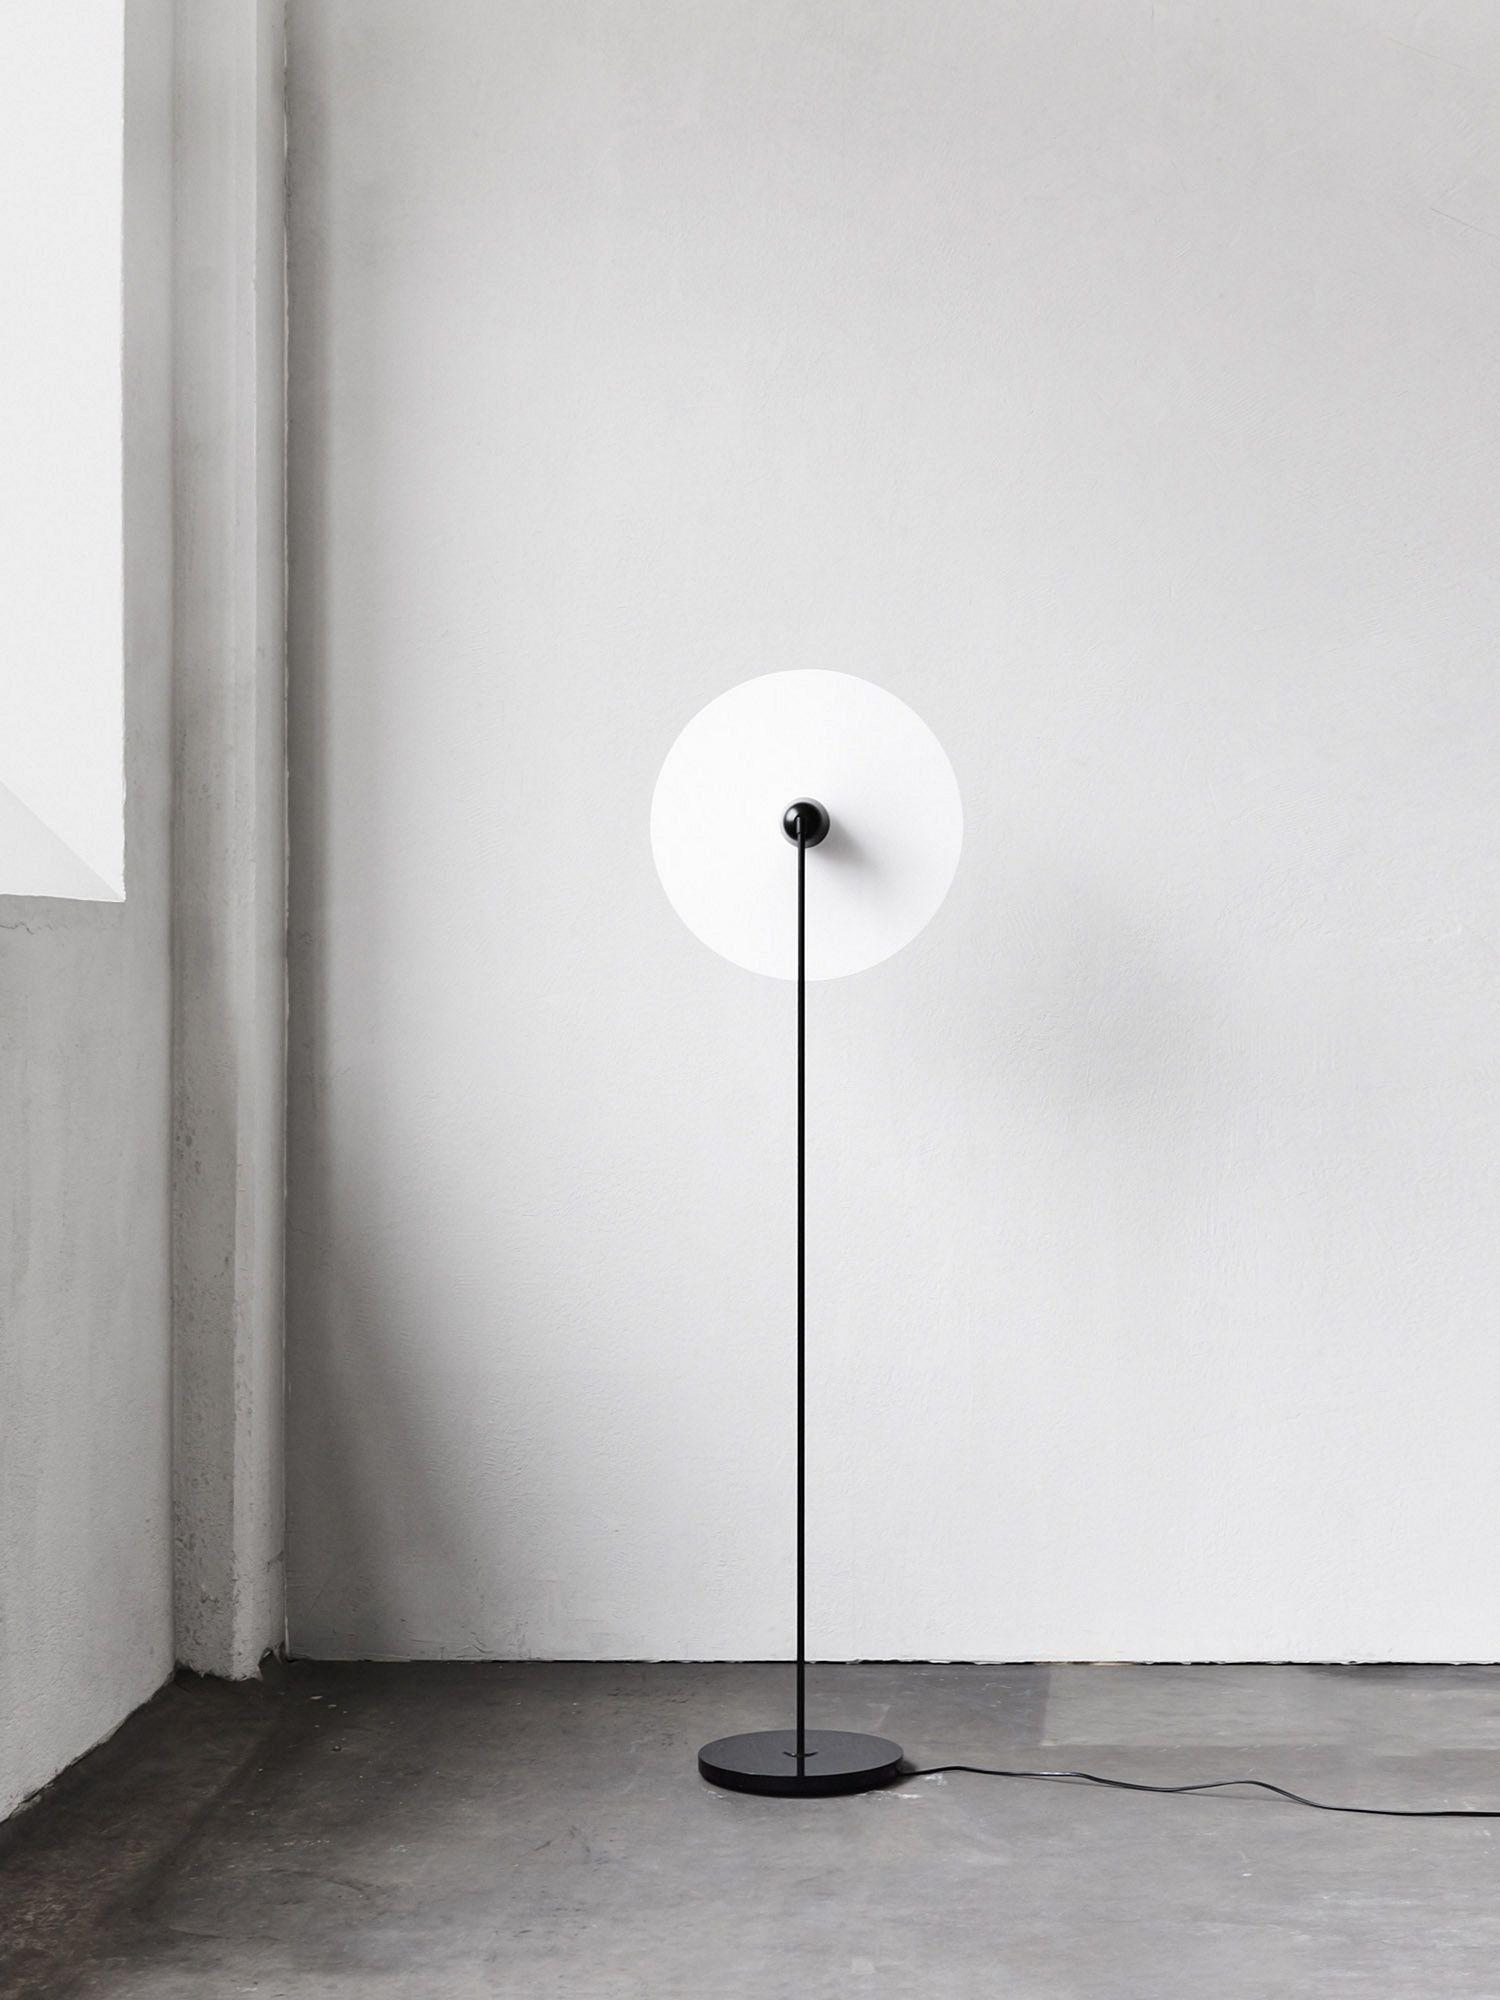 Lighting Ideas With Grey Walls Html on grey walls with fireplace, grey walls with design, grey walls with wood furniture, grey walls with art ideas,